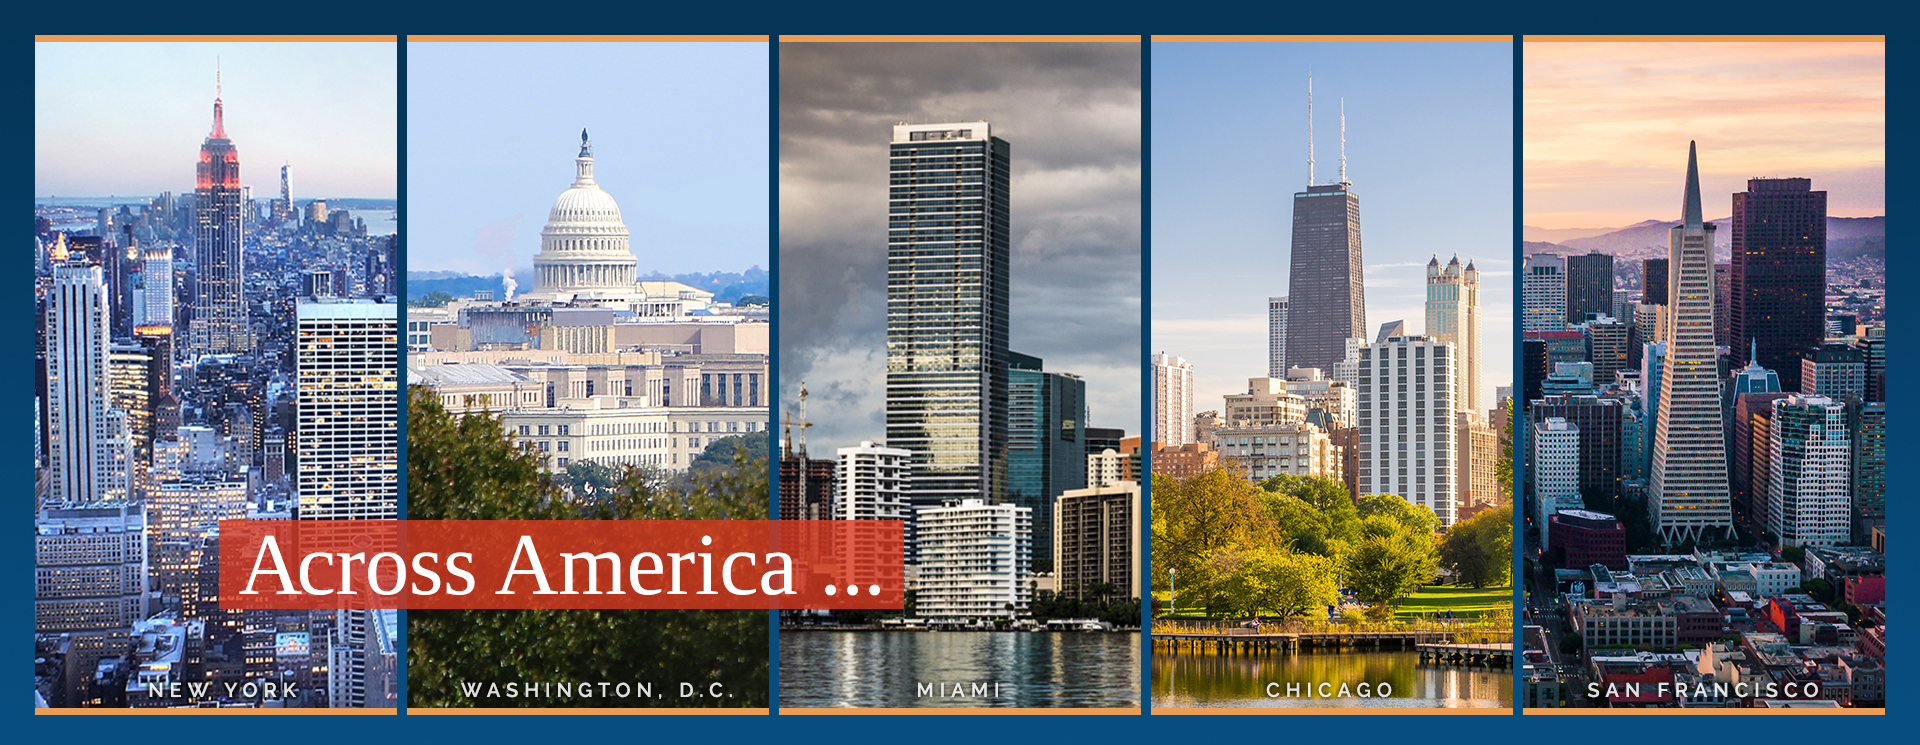 Across America ...